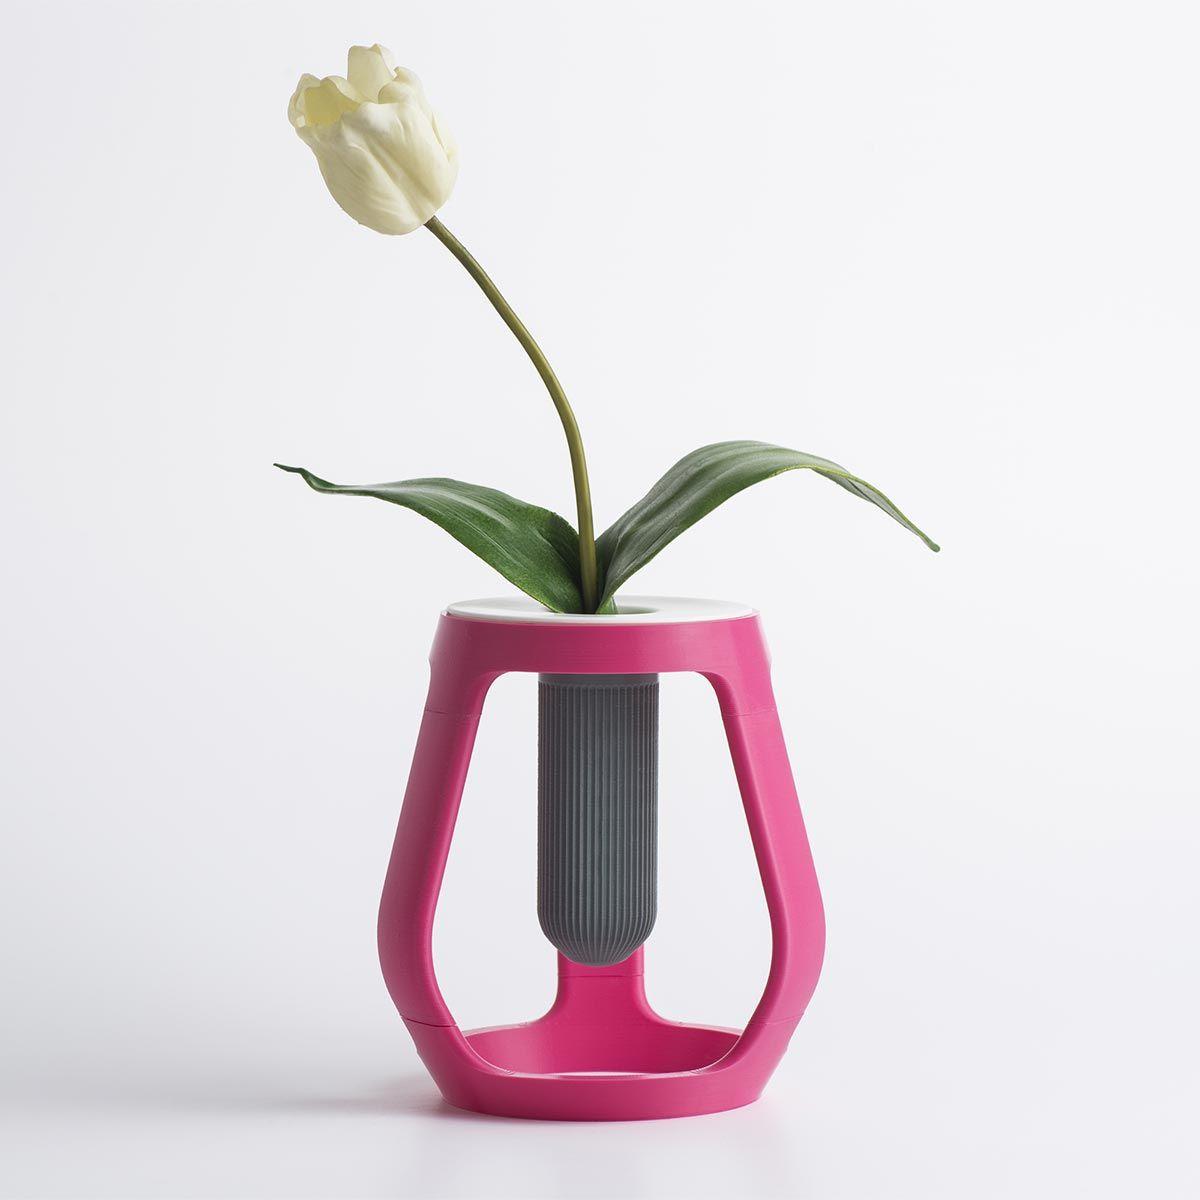 Gravity [Flower vase]